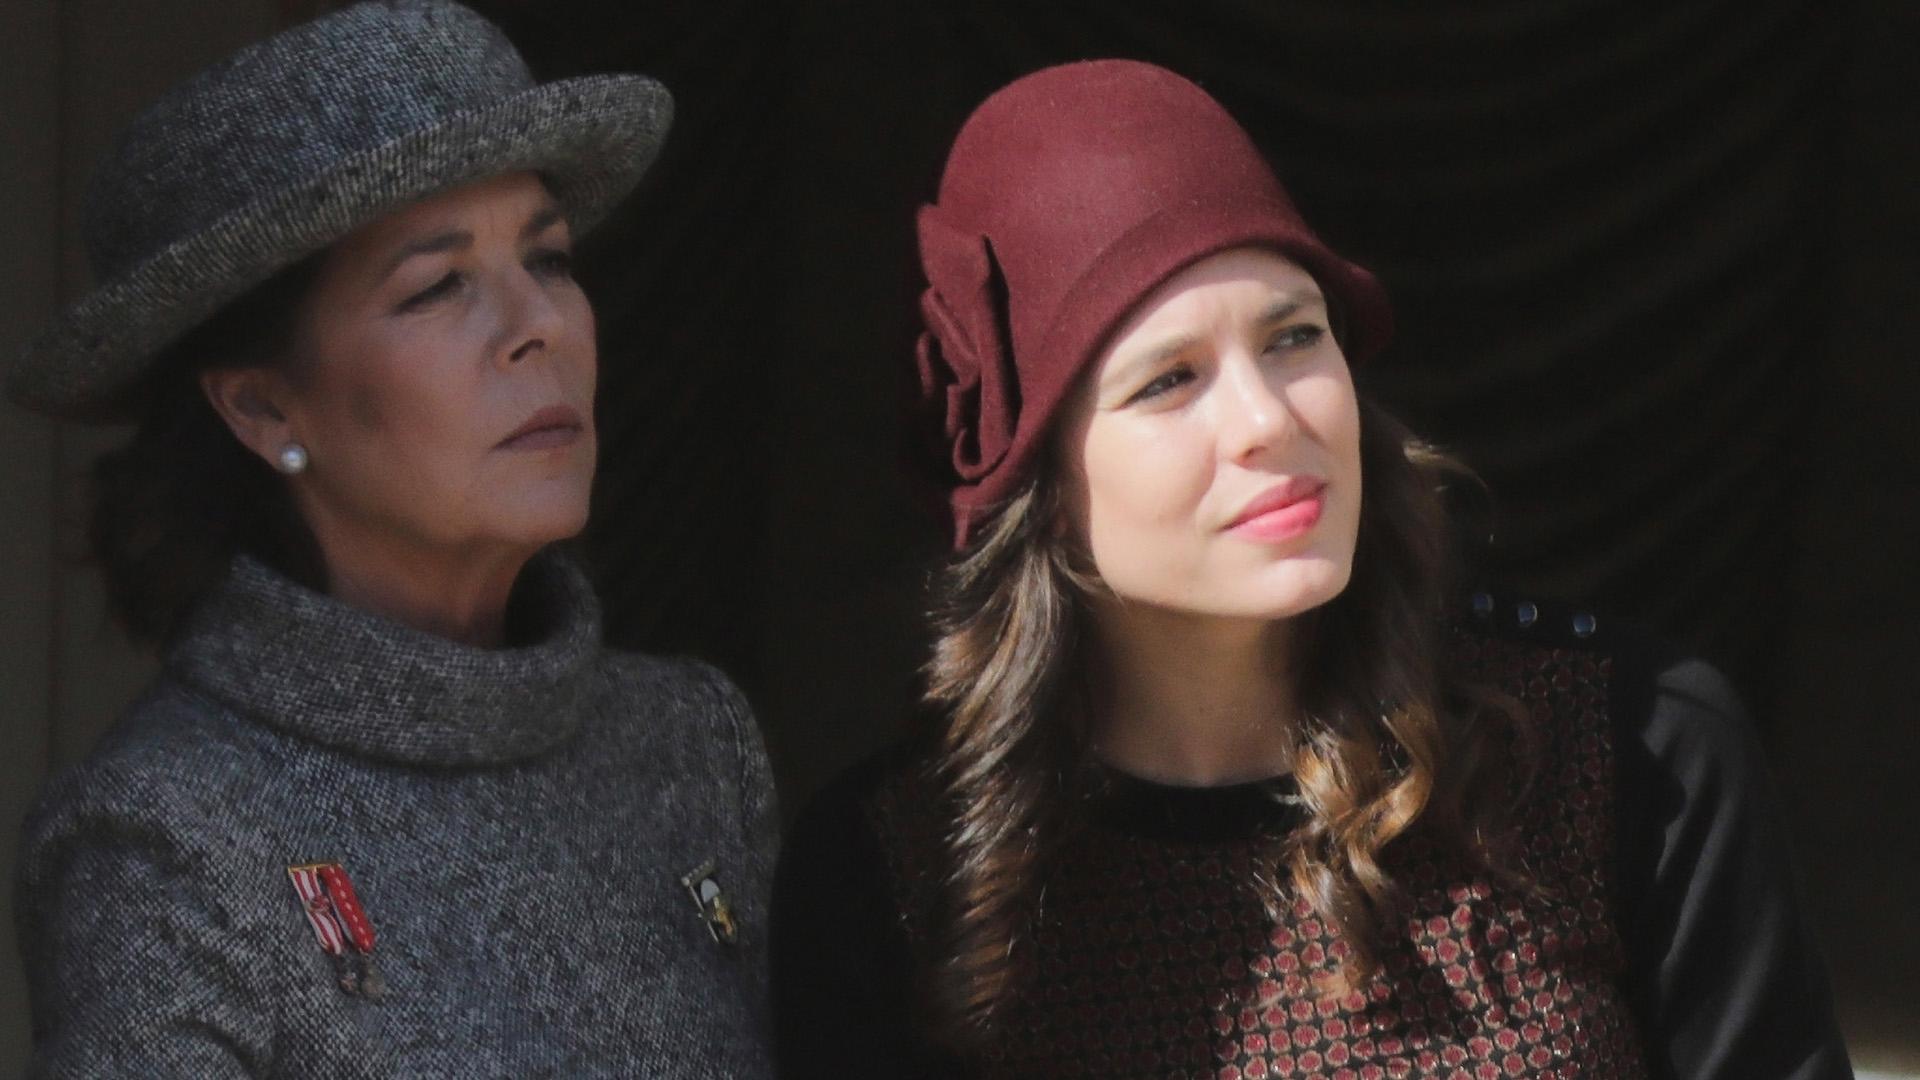 Carolina de Mónaco y su hija Charlotte